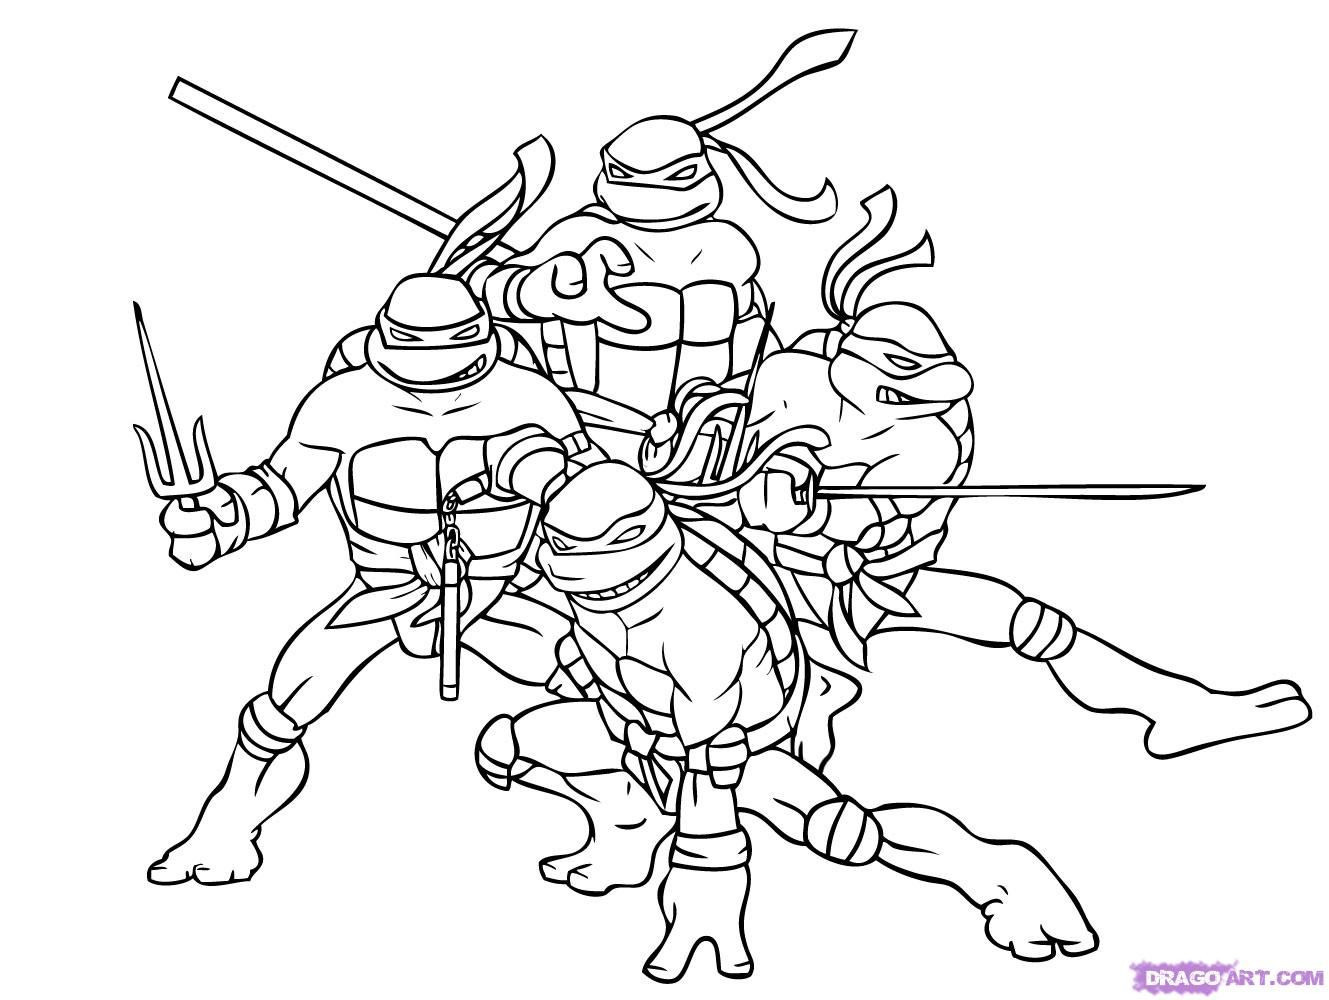 Ninja Turtle Ausmalbilder Inspirierend Teenage Mutant Ninja Turtles Faces Coloring Pages Unique 44 Neu Bild